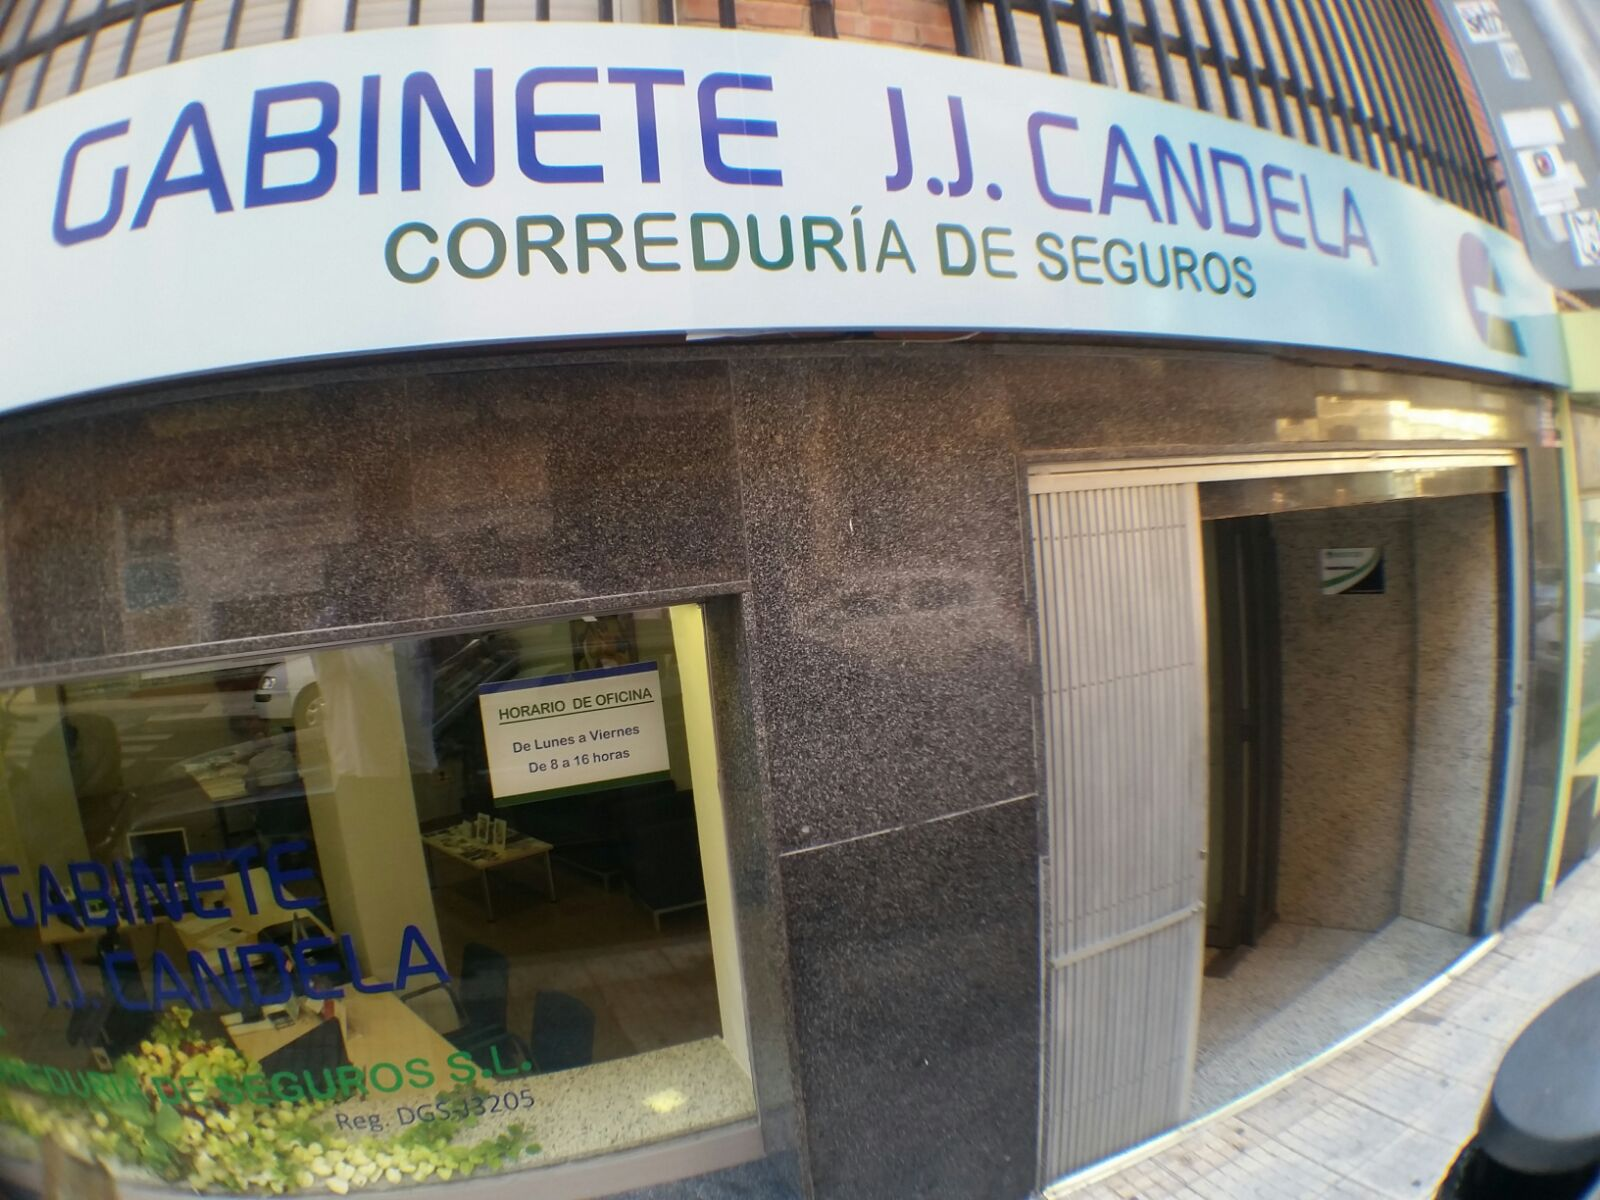 GABINETE J.J. CANDELA, CORREDURÍA DE SEGUROS.